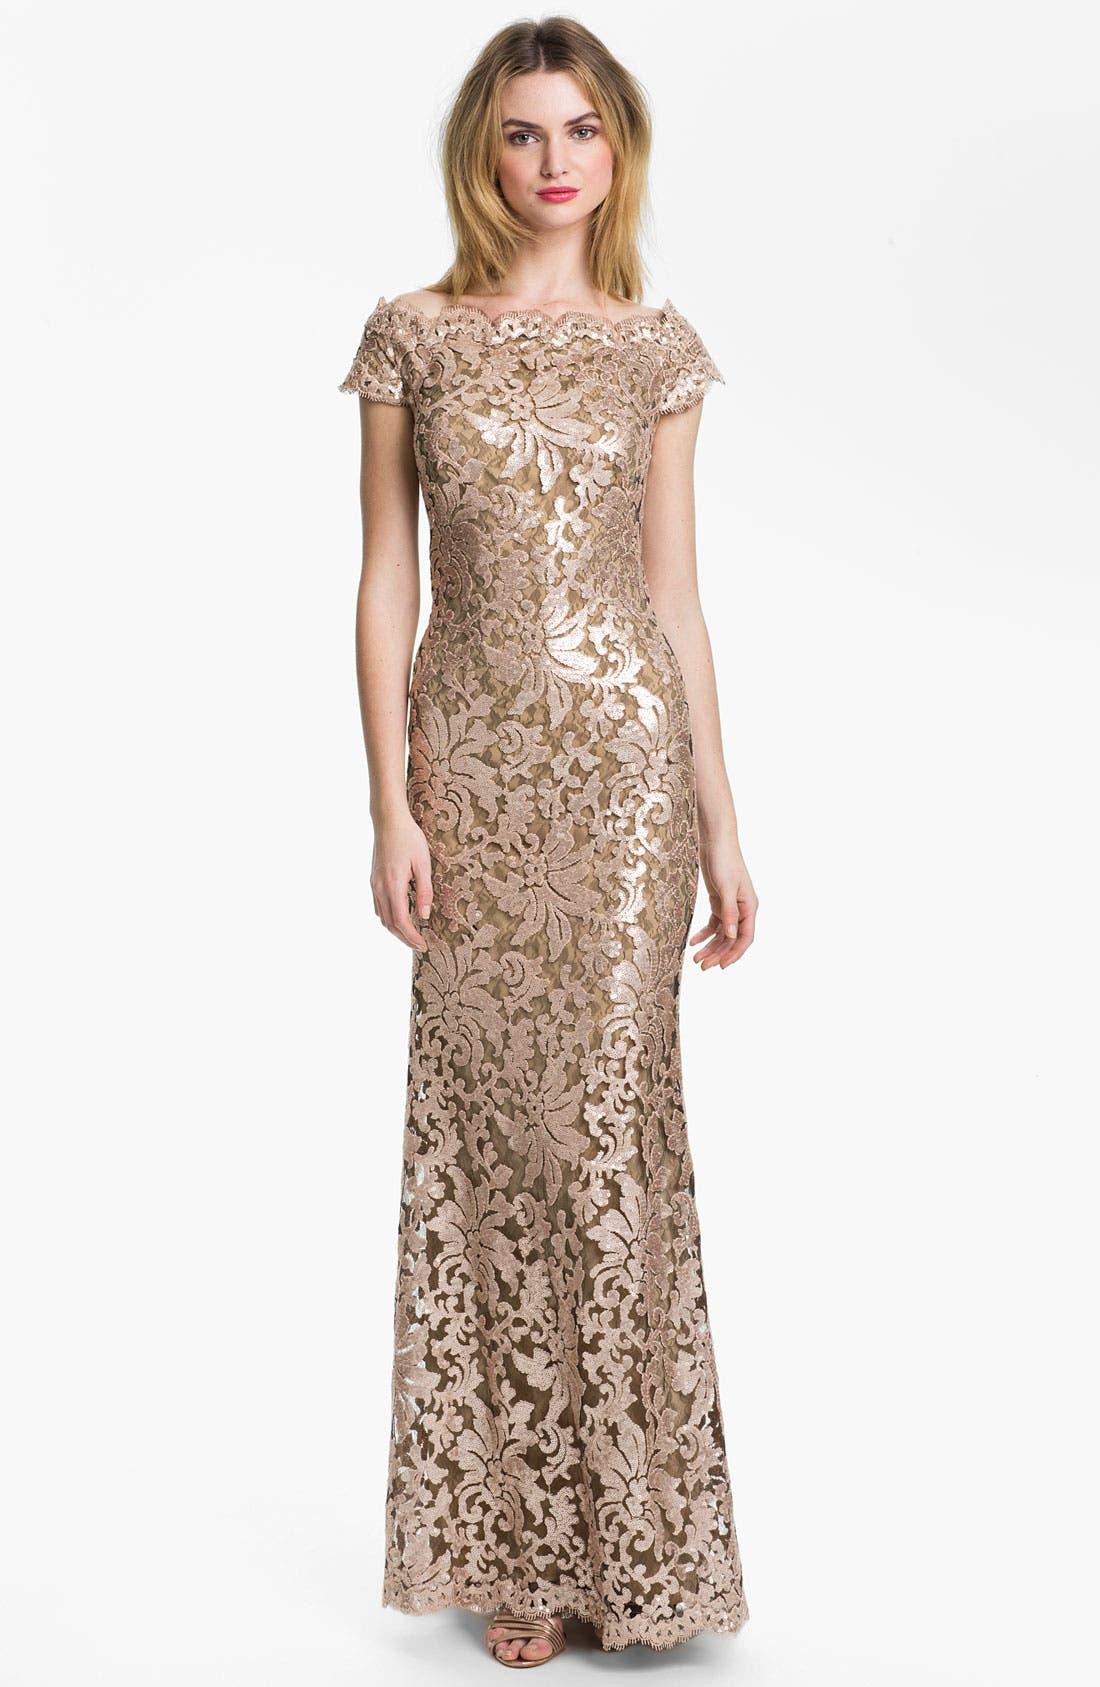 Alternate Image 1 Selected - Tadashi Shoji Sequin Lace Off Shoulder Gown